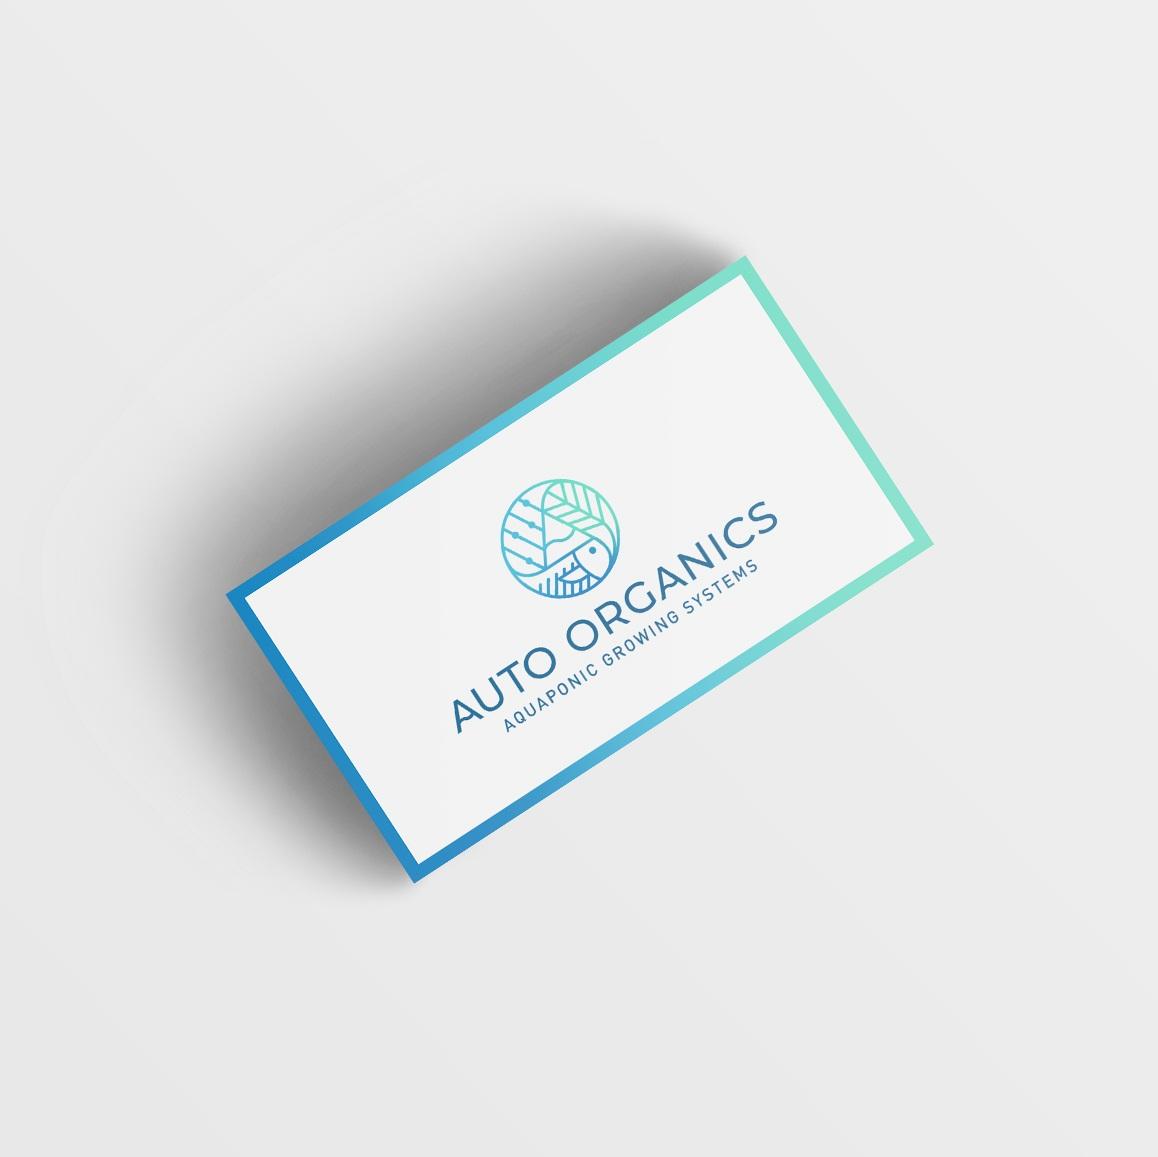 logo-business-card-auto-organics.jpg